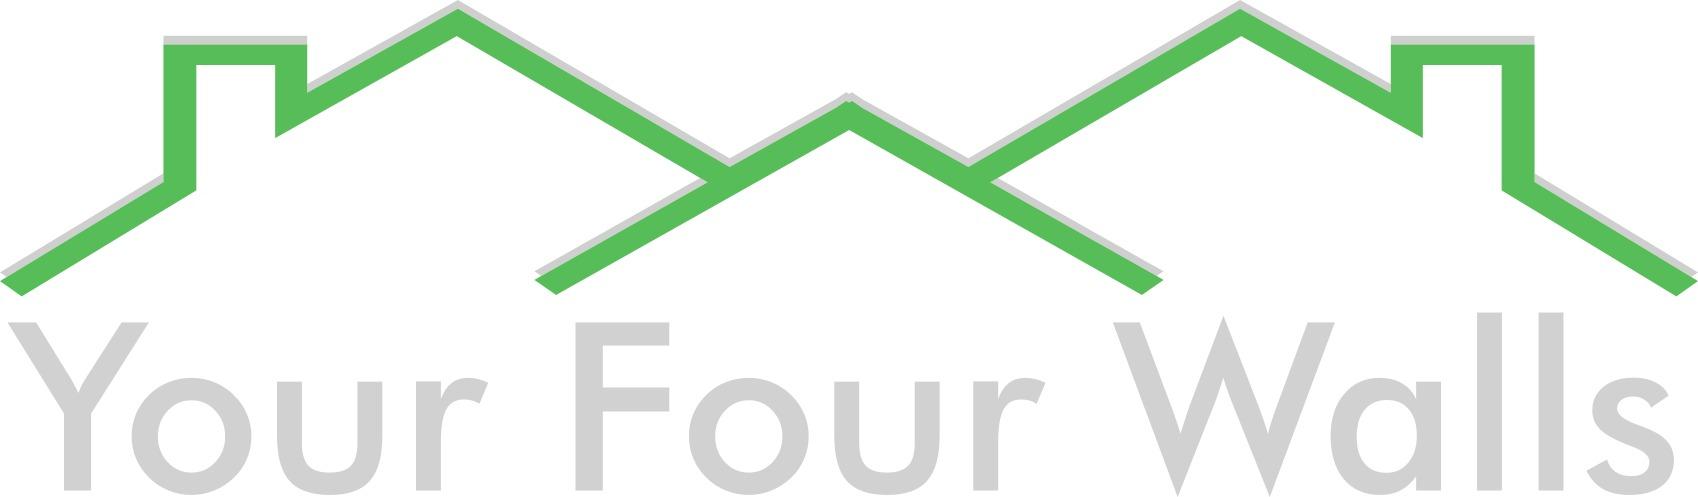 Your Four Walls (NE) Ltd - Winlaton, Tyne and Wear NE21 6BS - 01914 141462 | ShowMeLocal.com